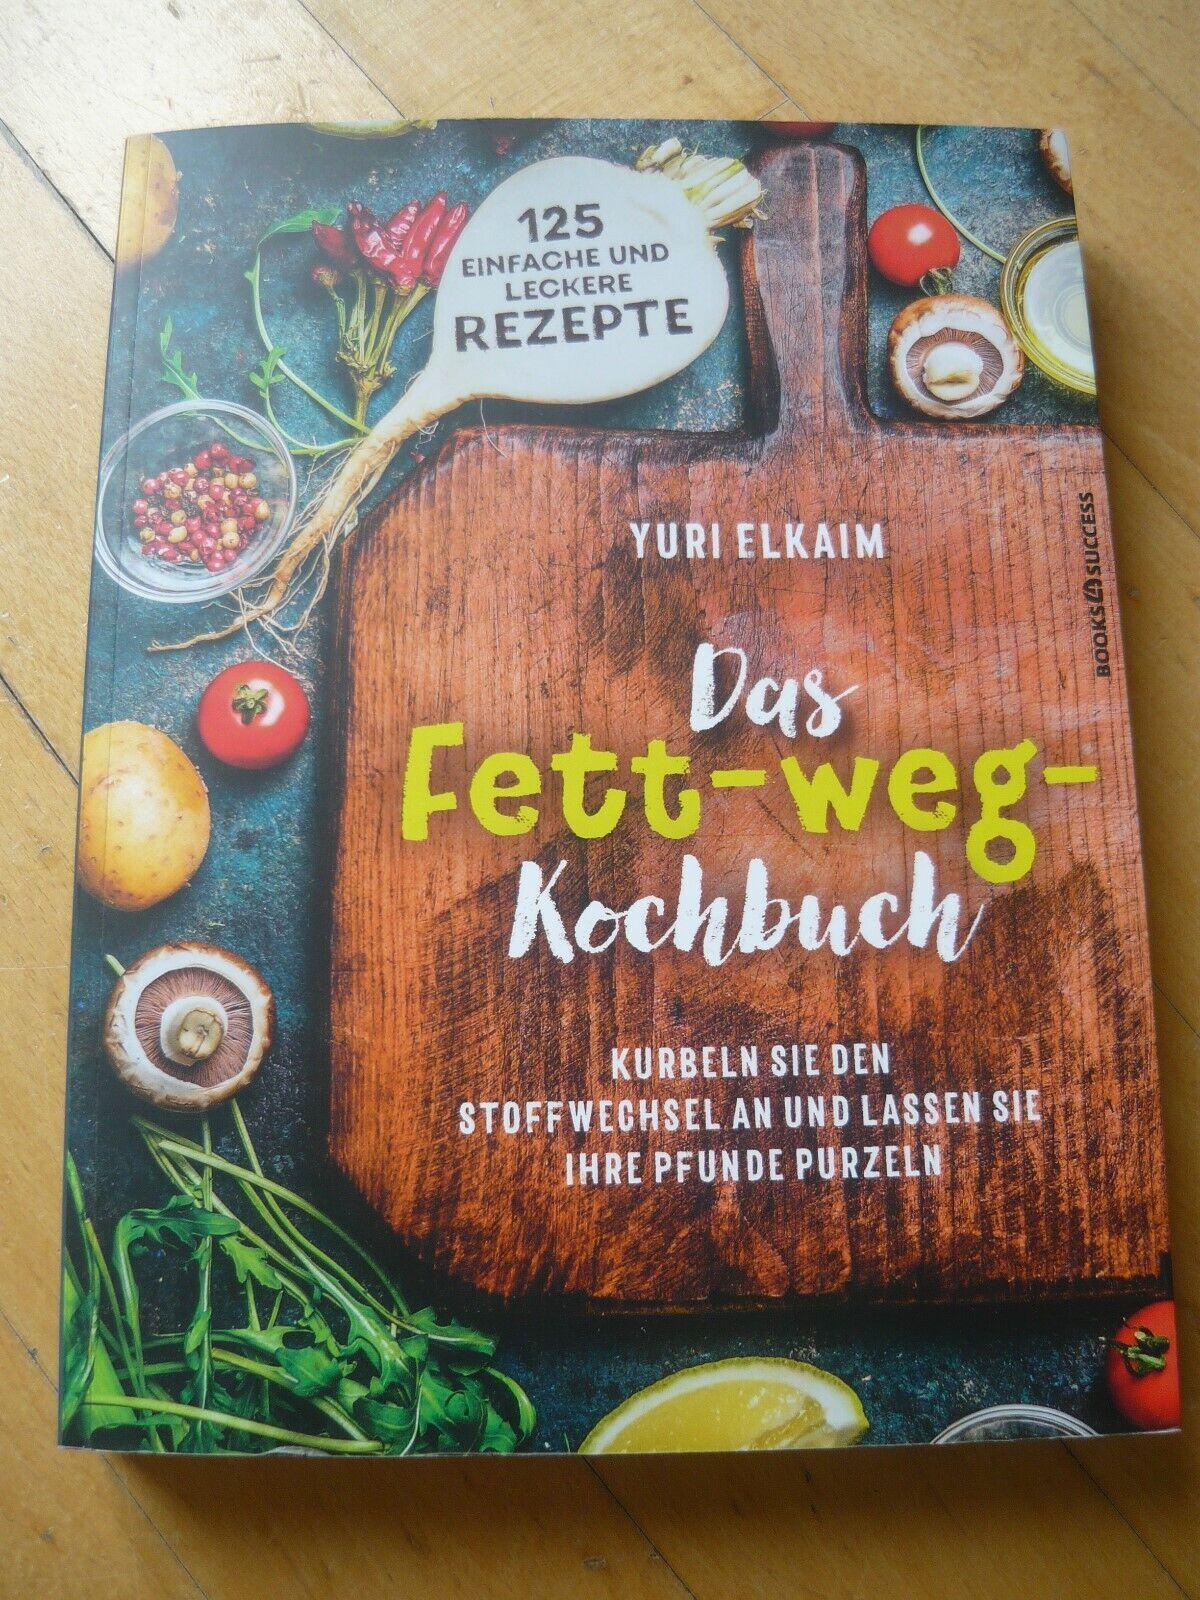 Y. Elkaim: Das Fett-weg-Kochbuch (Stoffwechsel ankurbeln) UNGELESEN